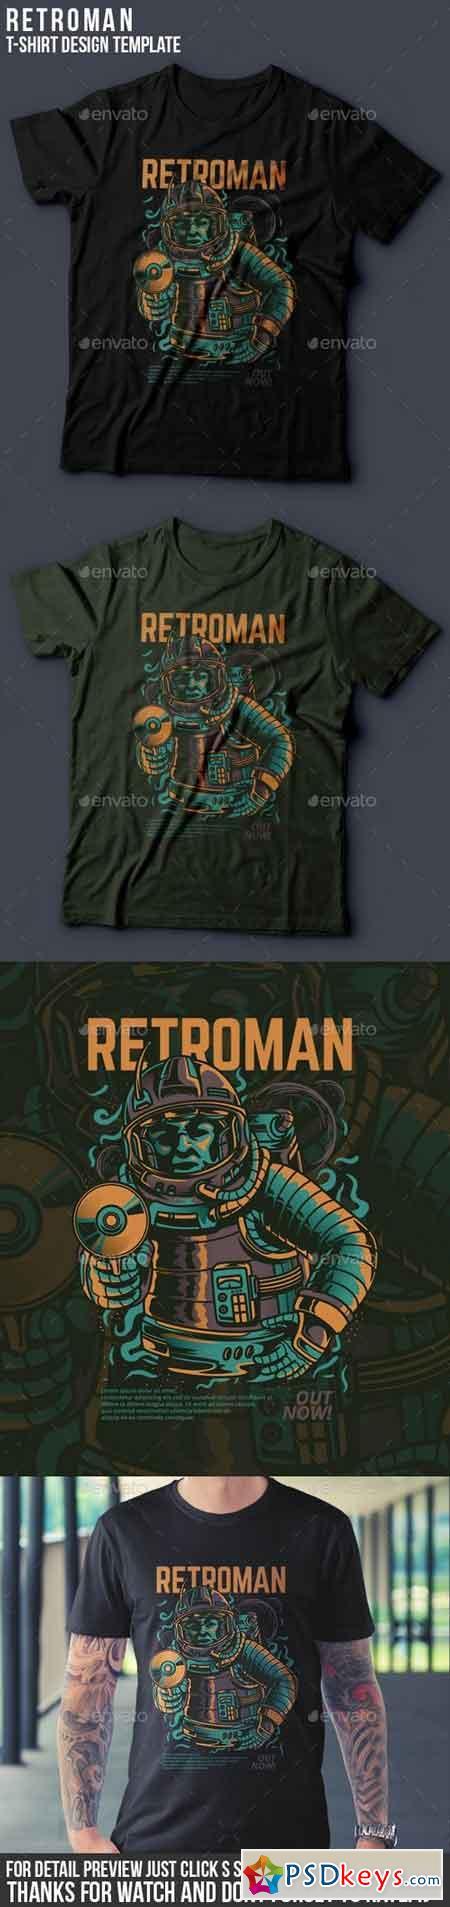 Retroman T-Shirt Design 21055042